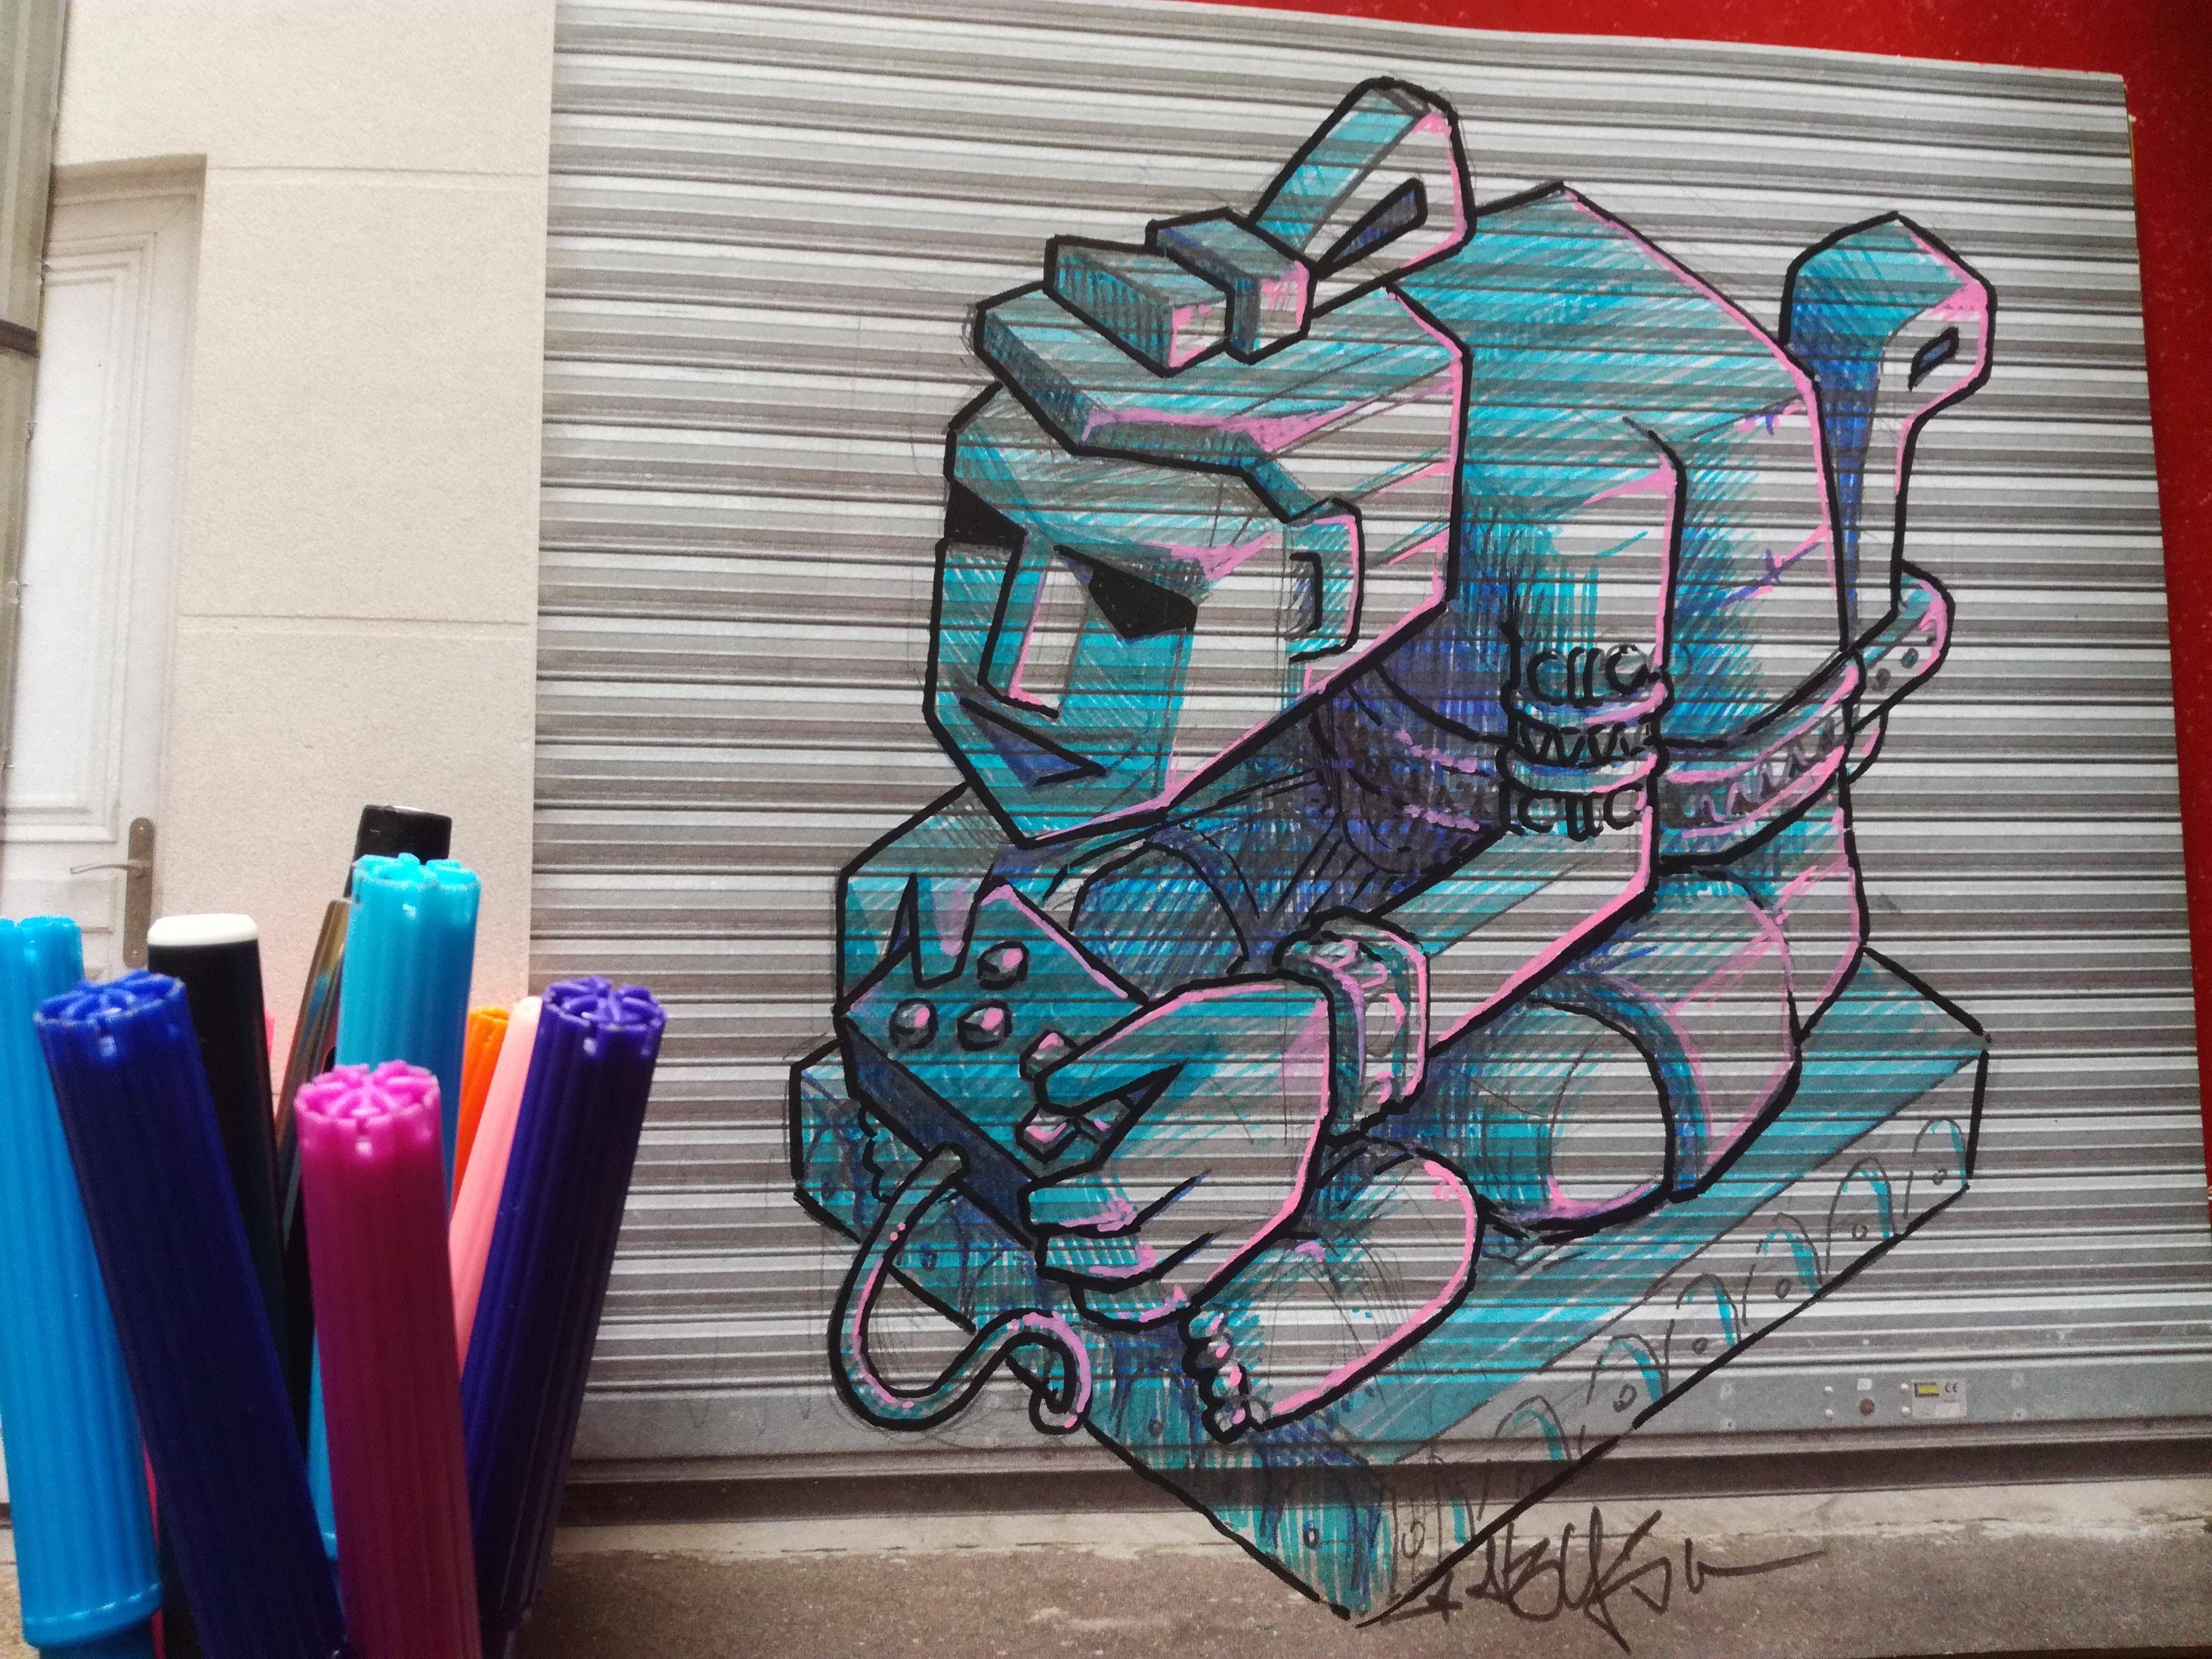 abys - da lyon - illustration streetart geek idoll antic gamer